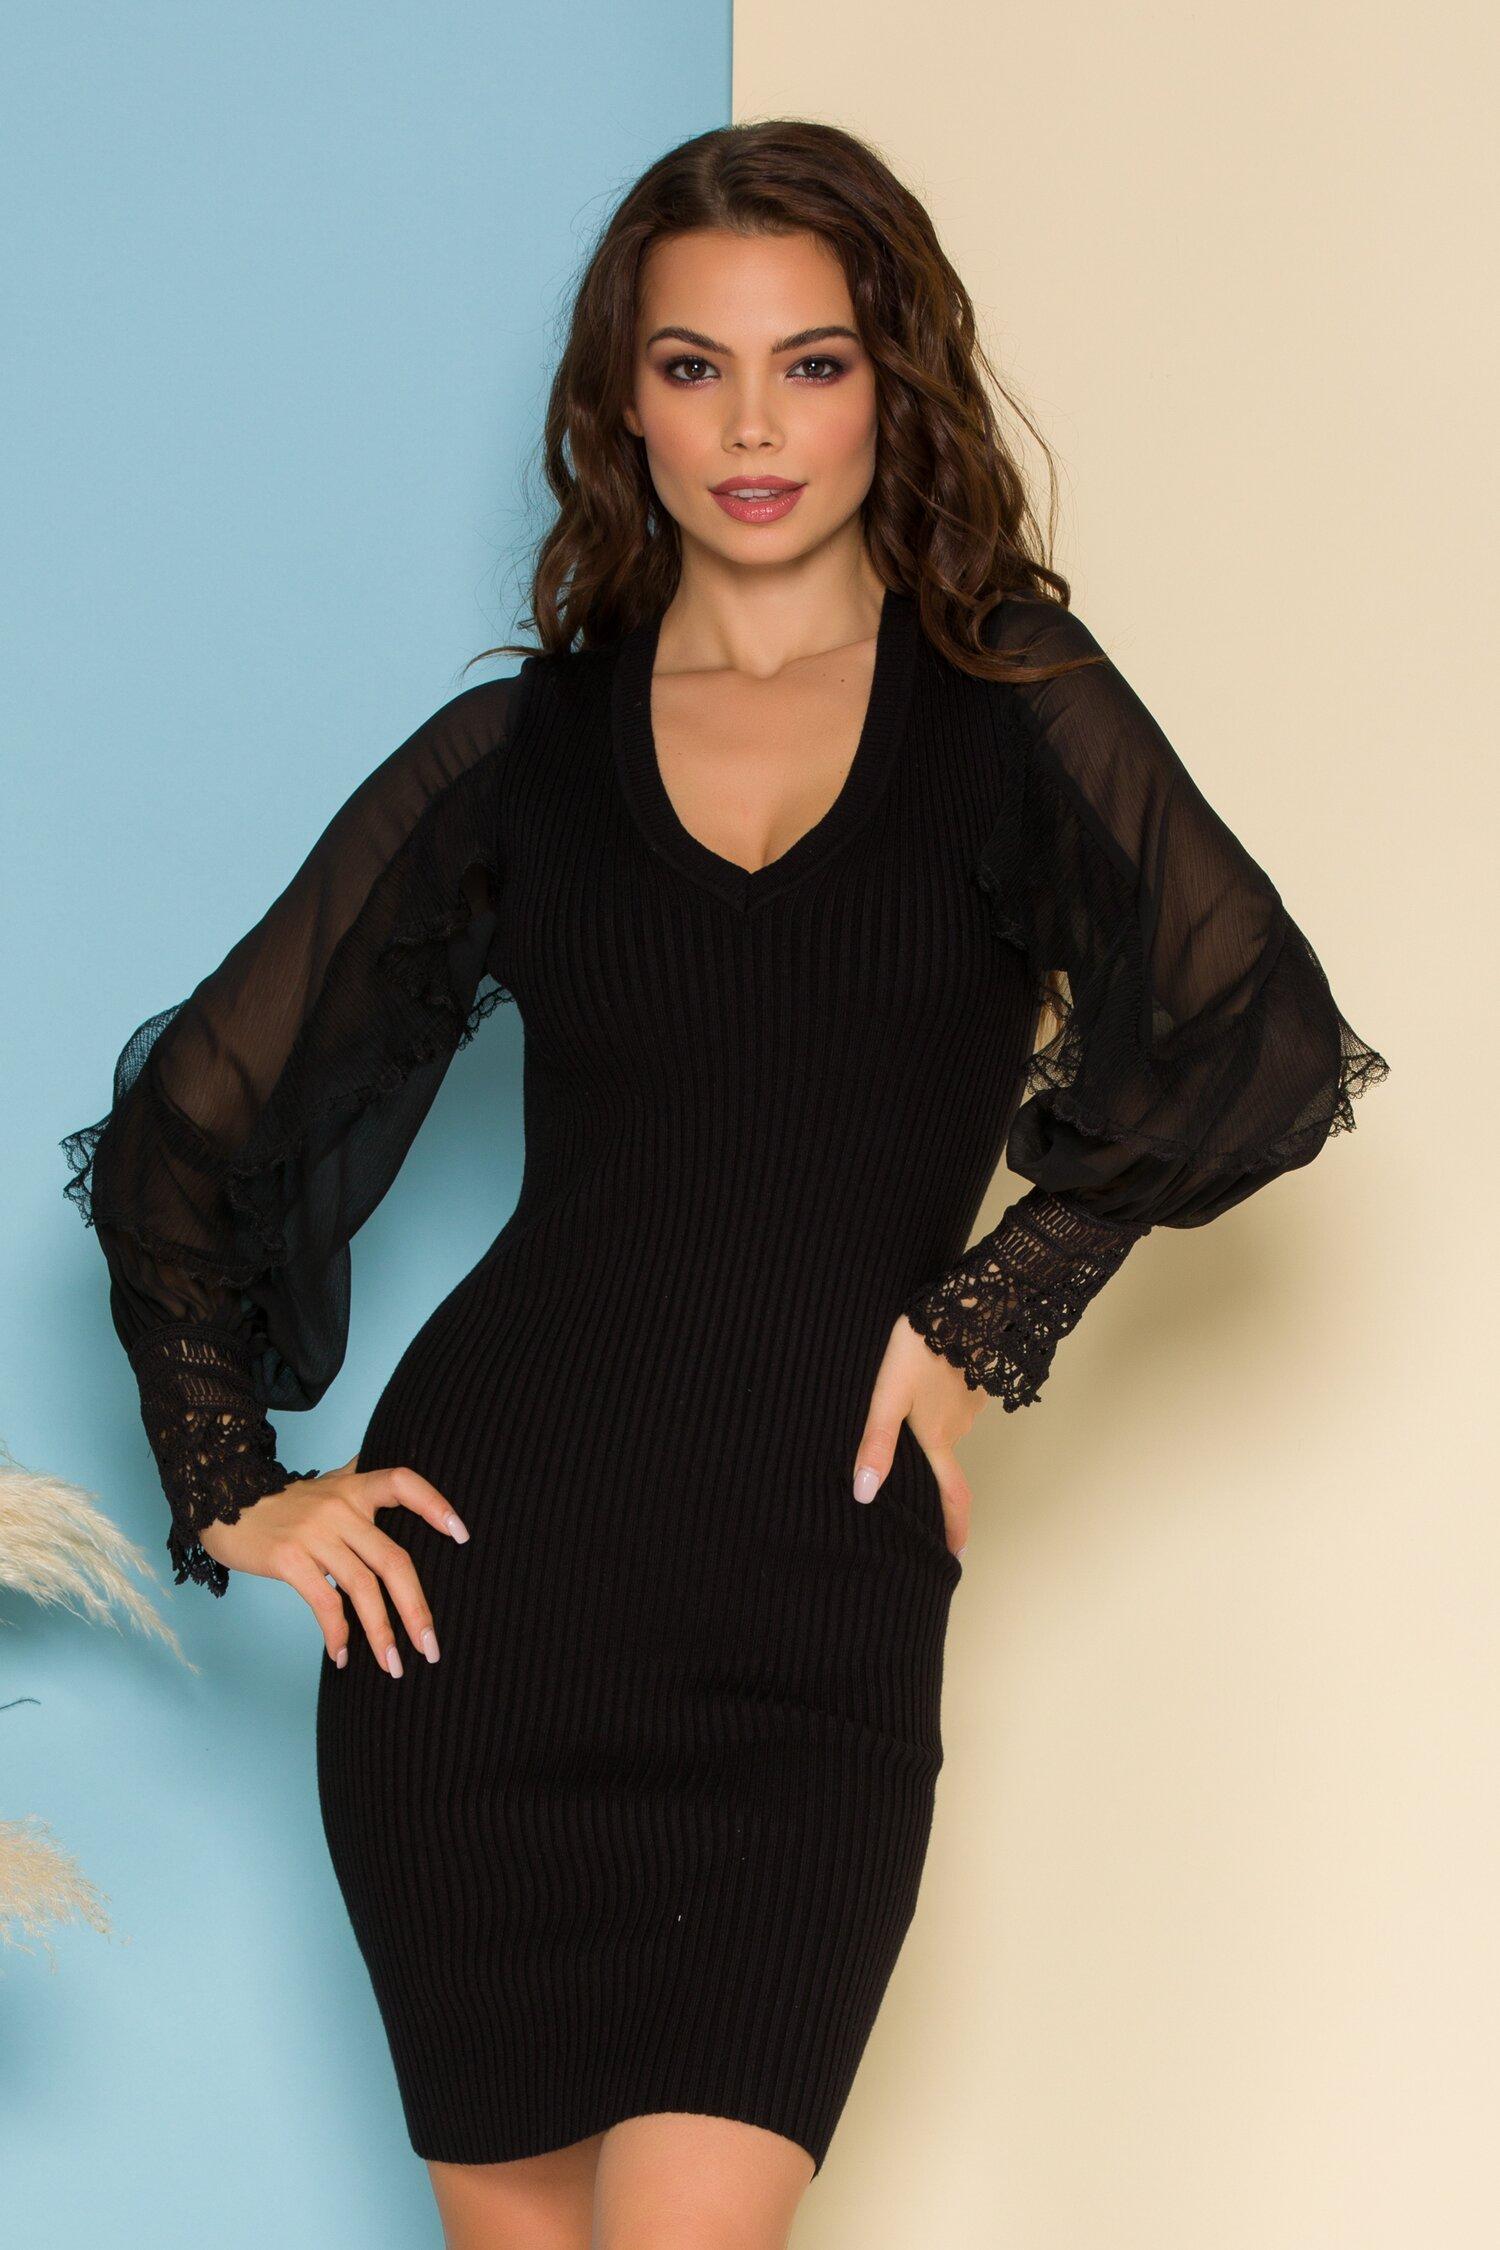 Rochie Amelia neagra din tricot cu maneci din voal cu volanase